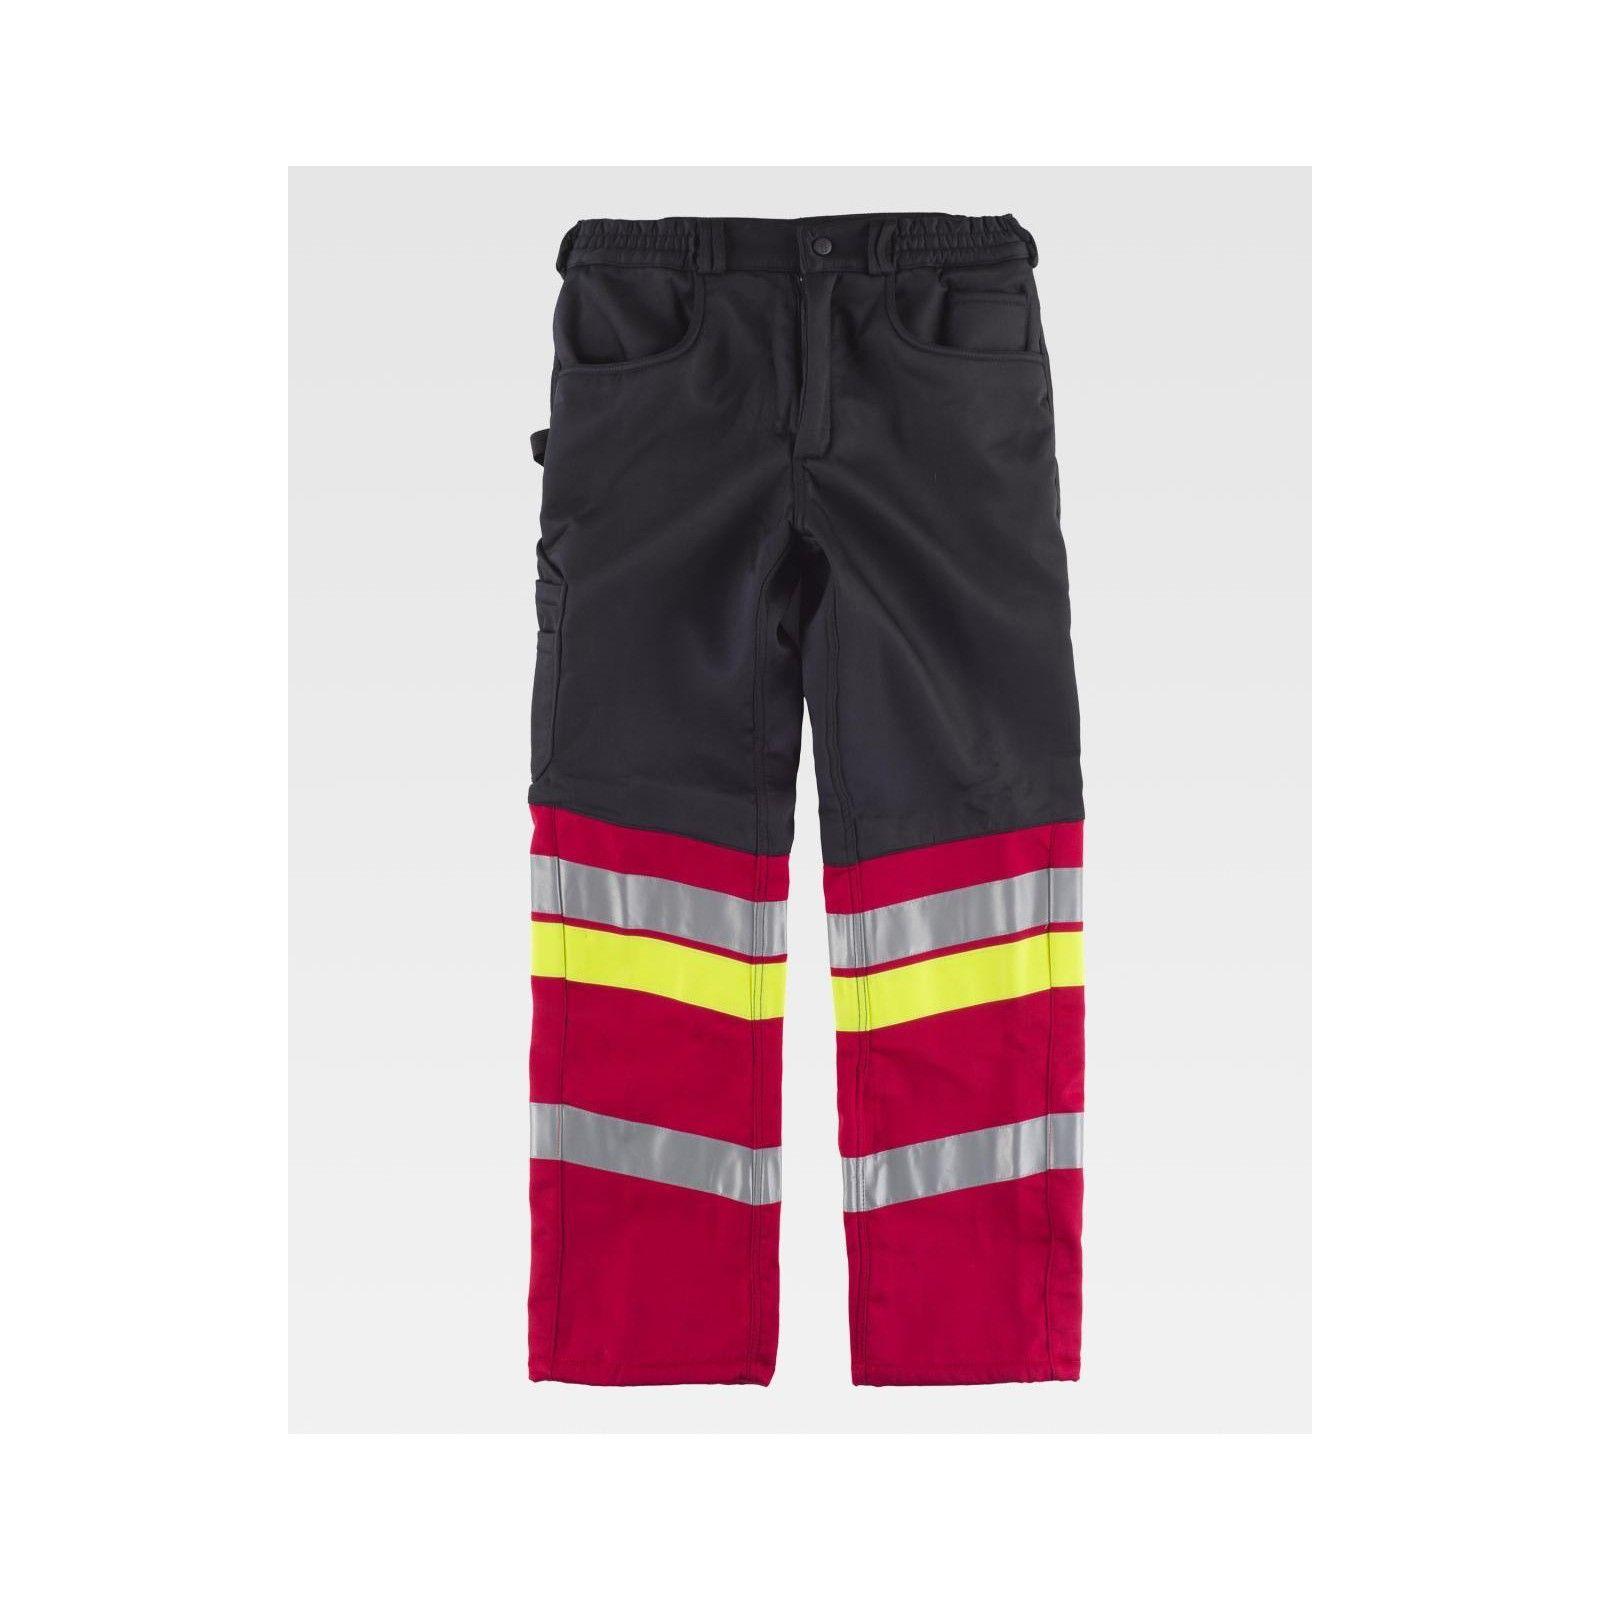 Pantalone c/pile interno multitasche c/bande Rifrangenti